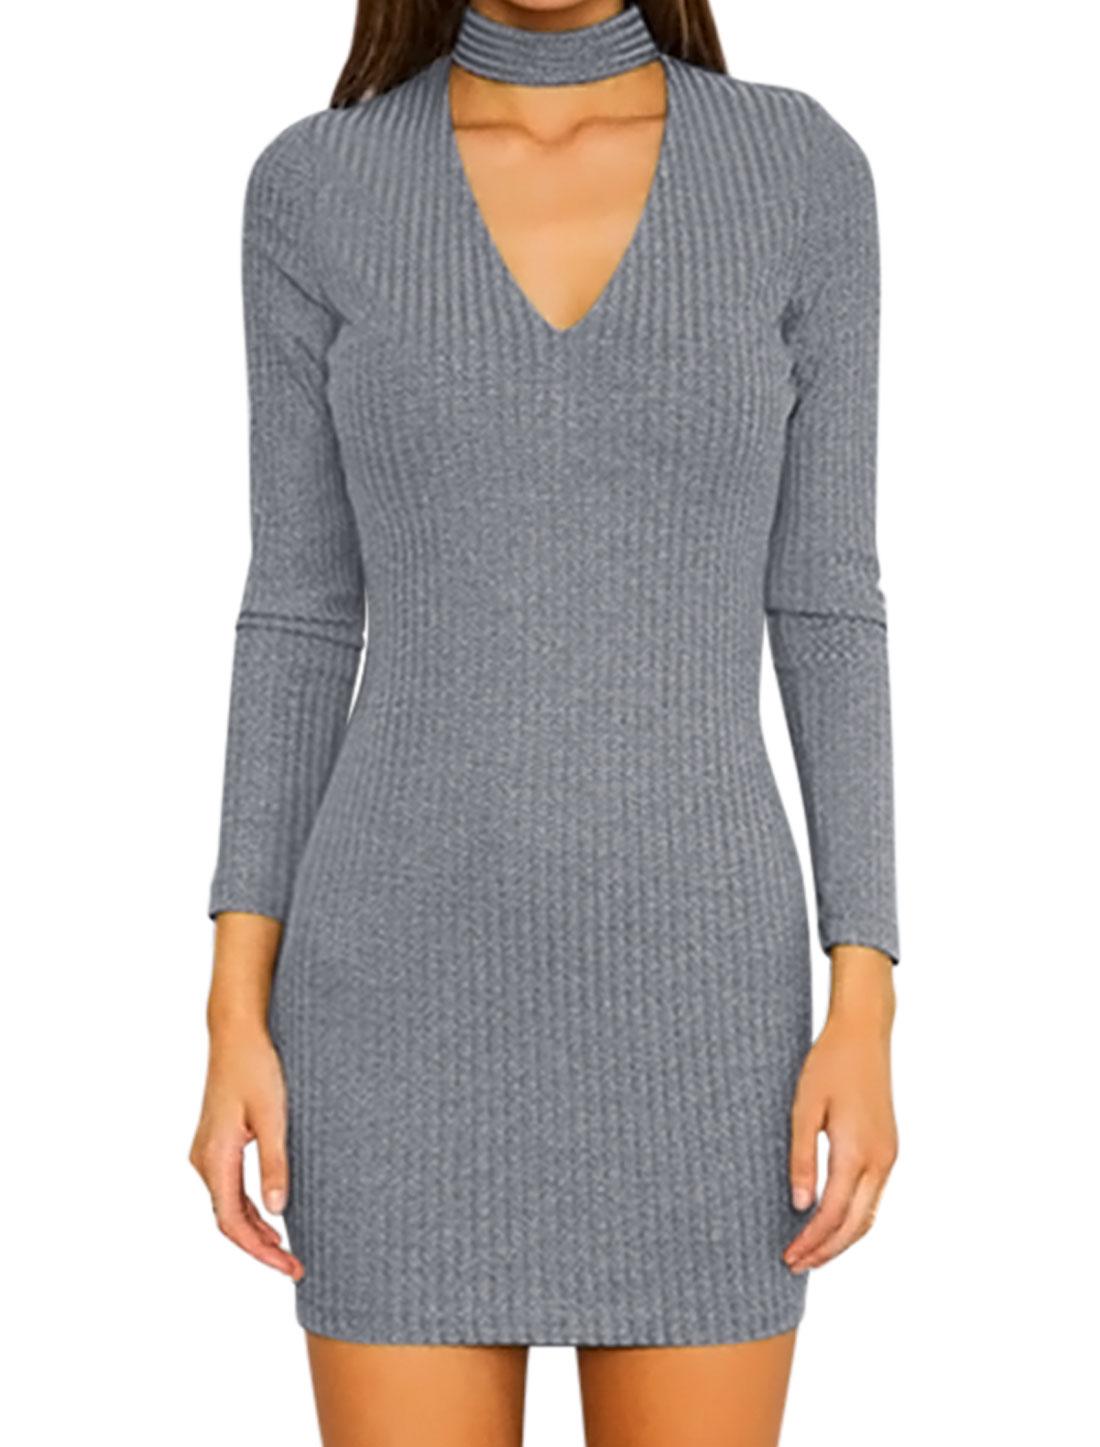 Women Choker Neck Long Sleeve Ribbed Design Tunic Sheath Dress Gray XS